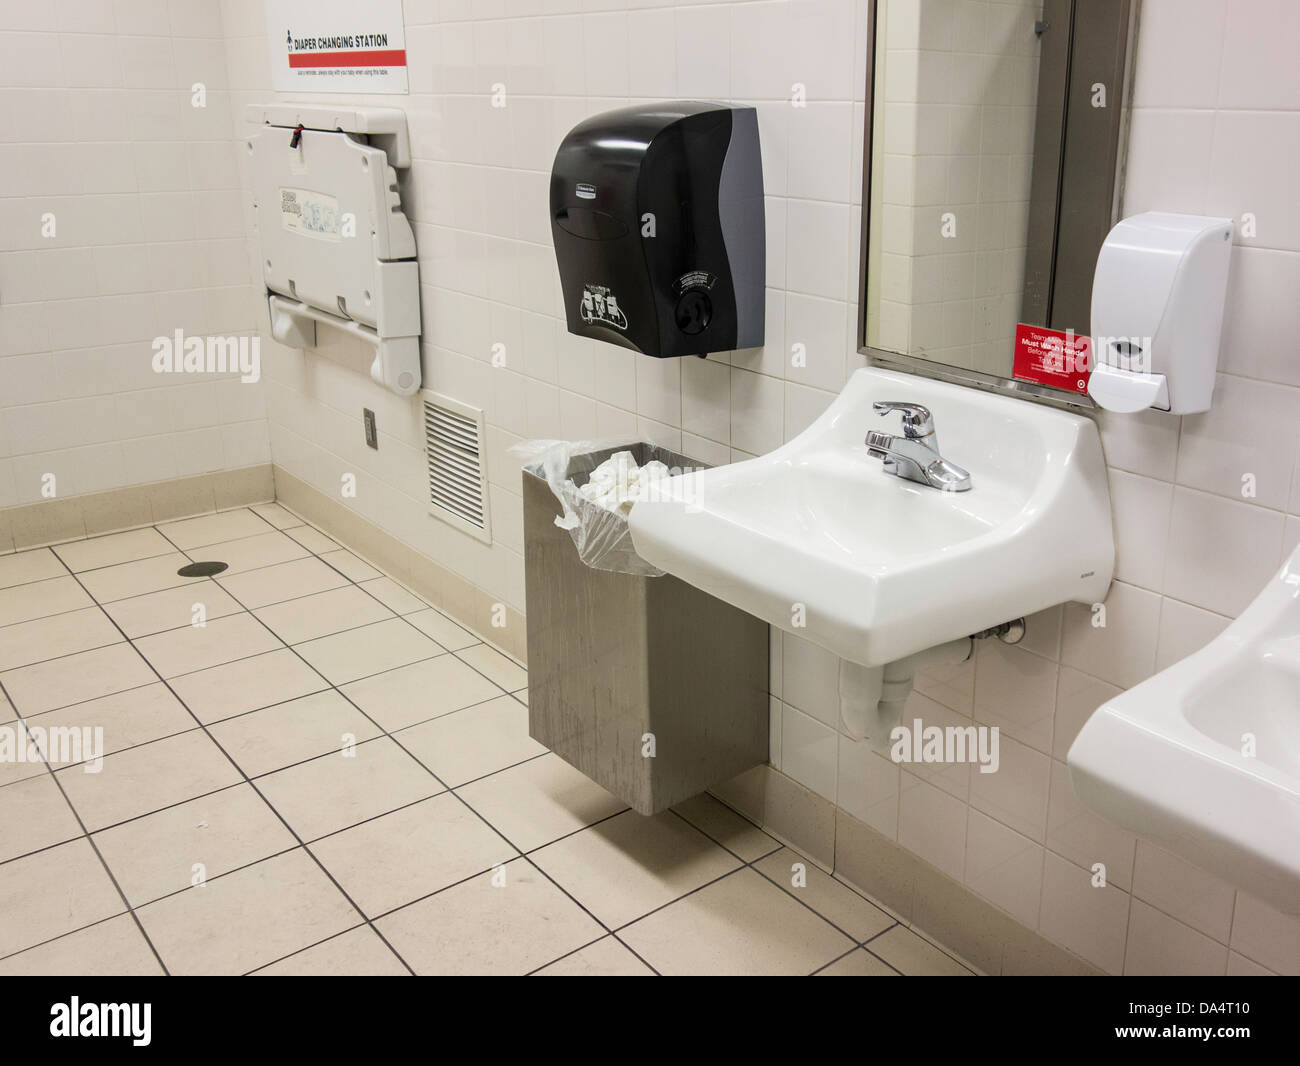 Bathroom Changing Table public bathroom baby stock photos & public bathroom baby stock